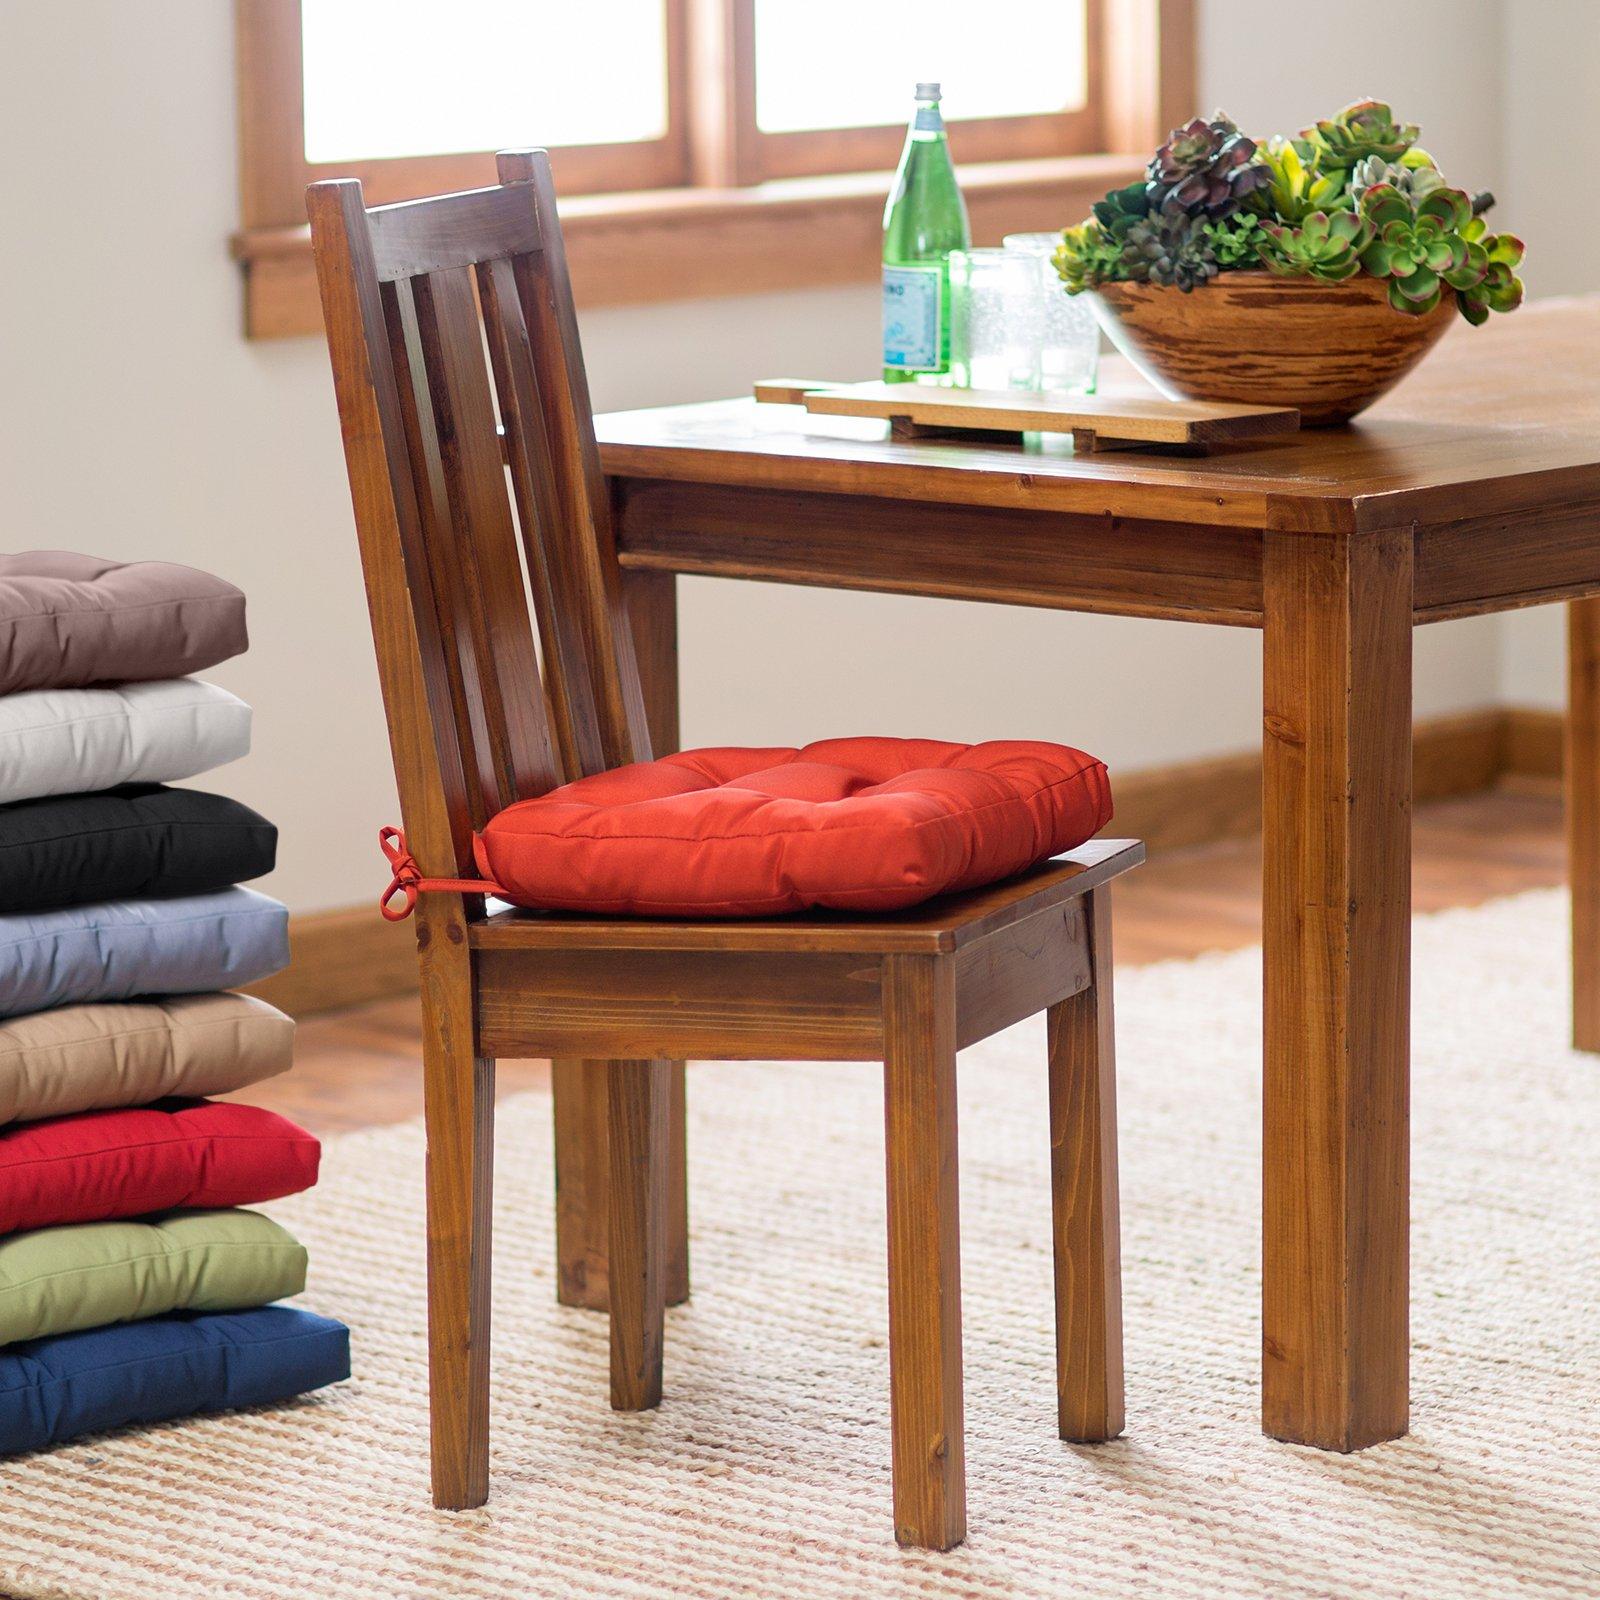 Chair cushions tufted kitchen chair cushions |  Hayneedle BQJMJFR